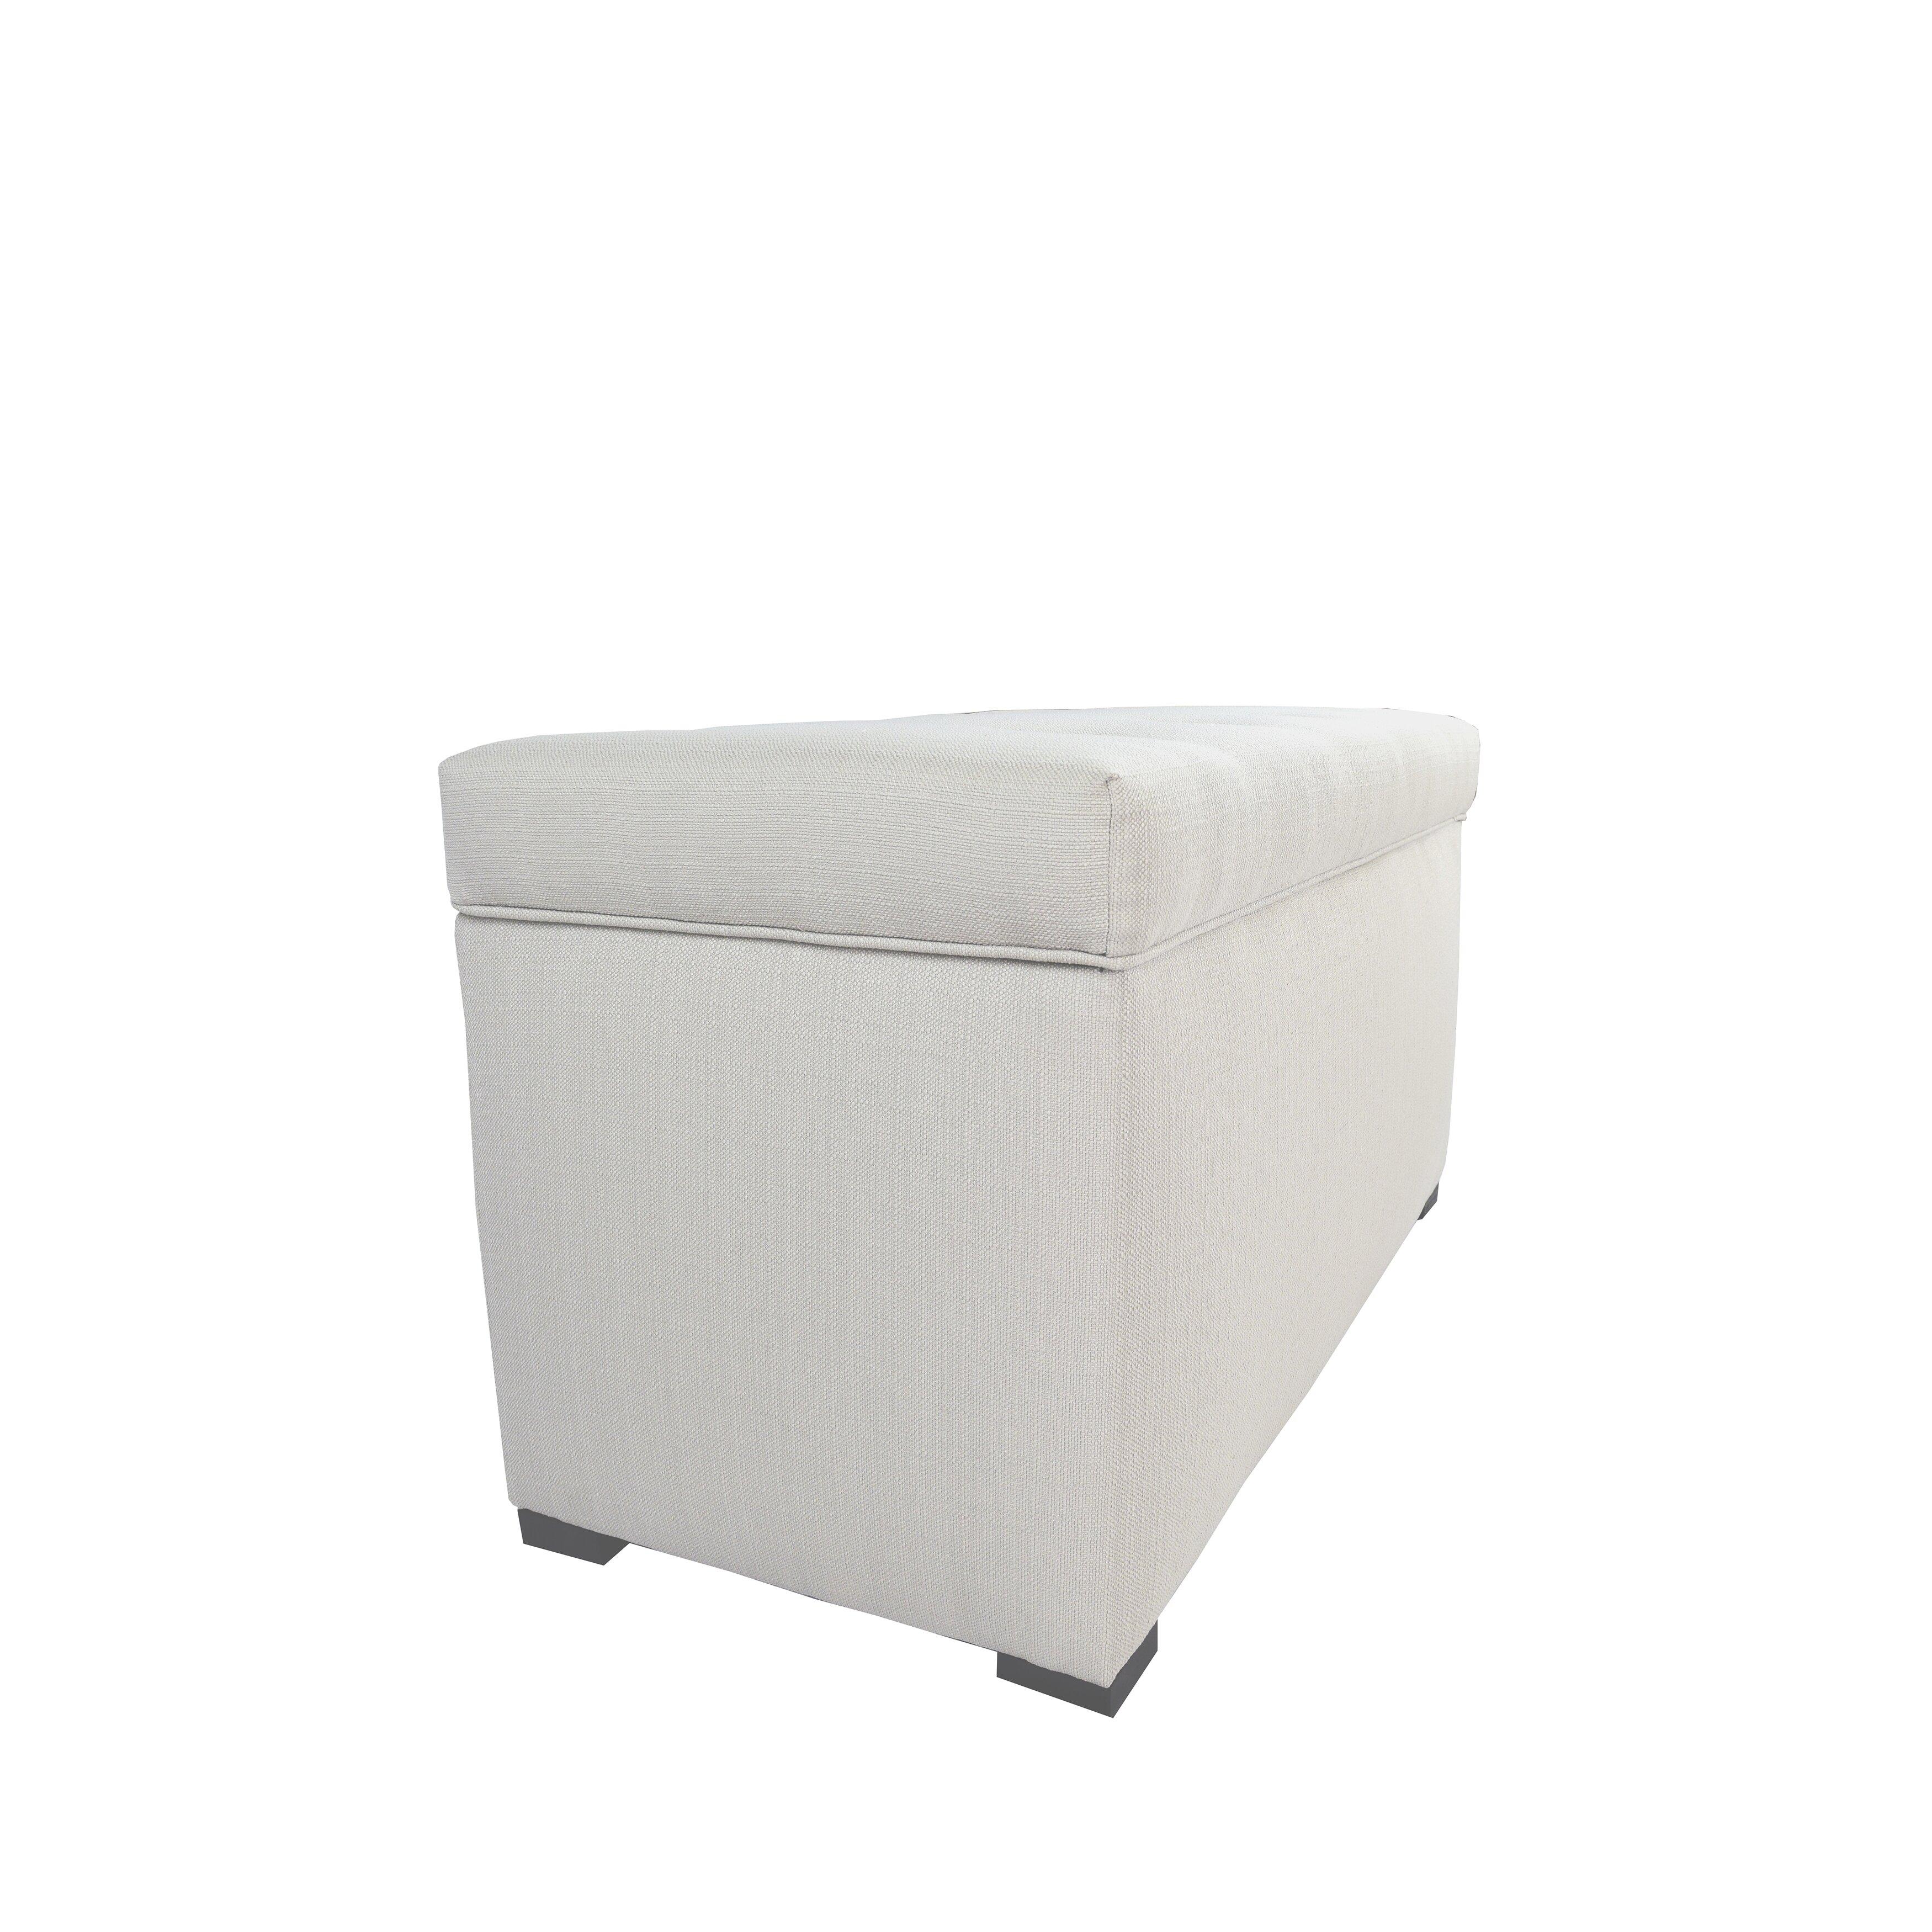 Mjlfurniture Angela Upholstered Storage Bench Reviews Wayfair